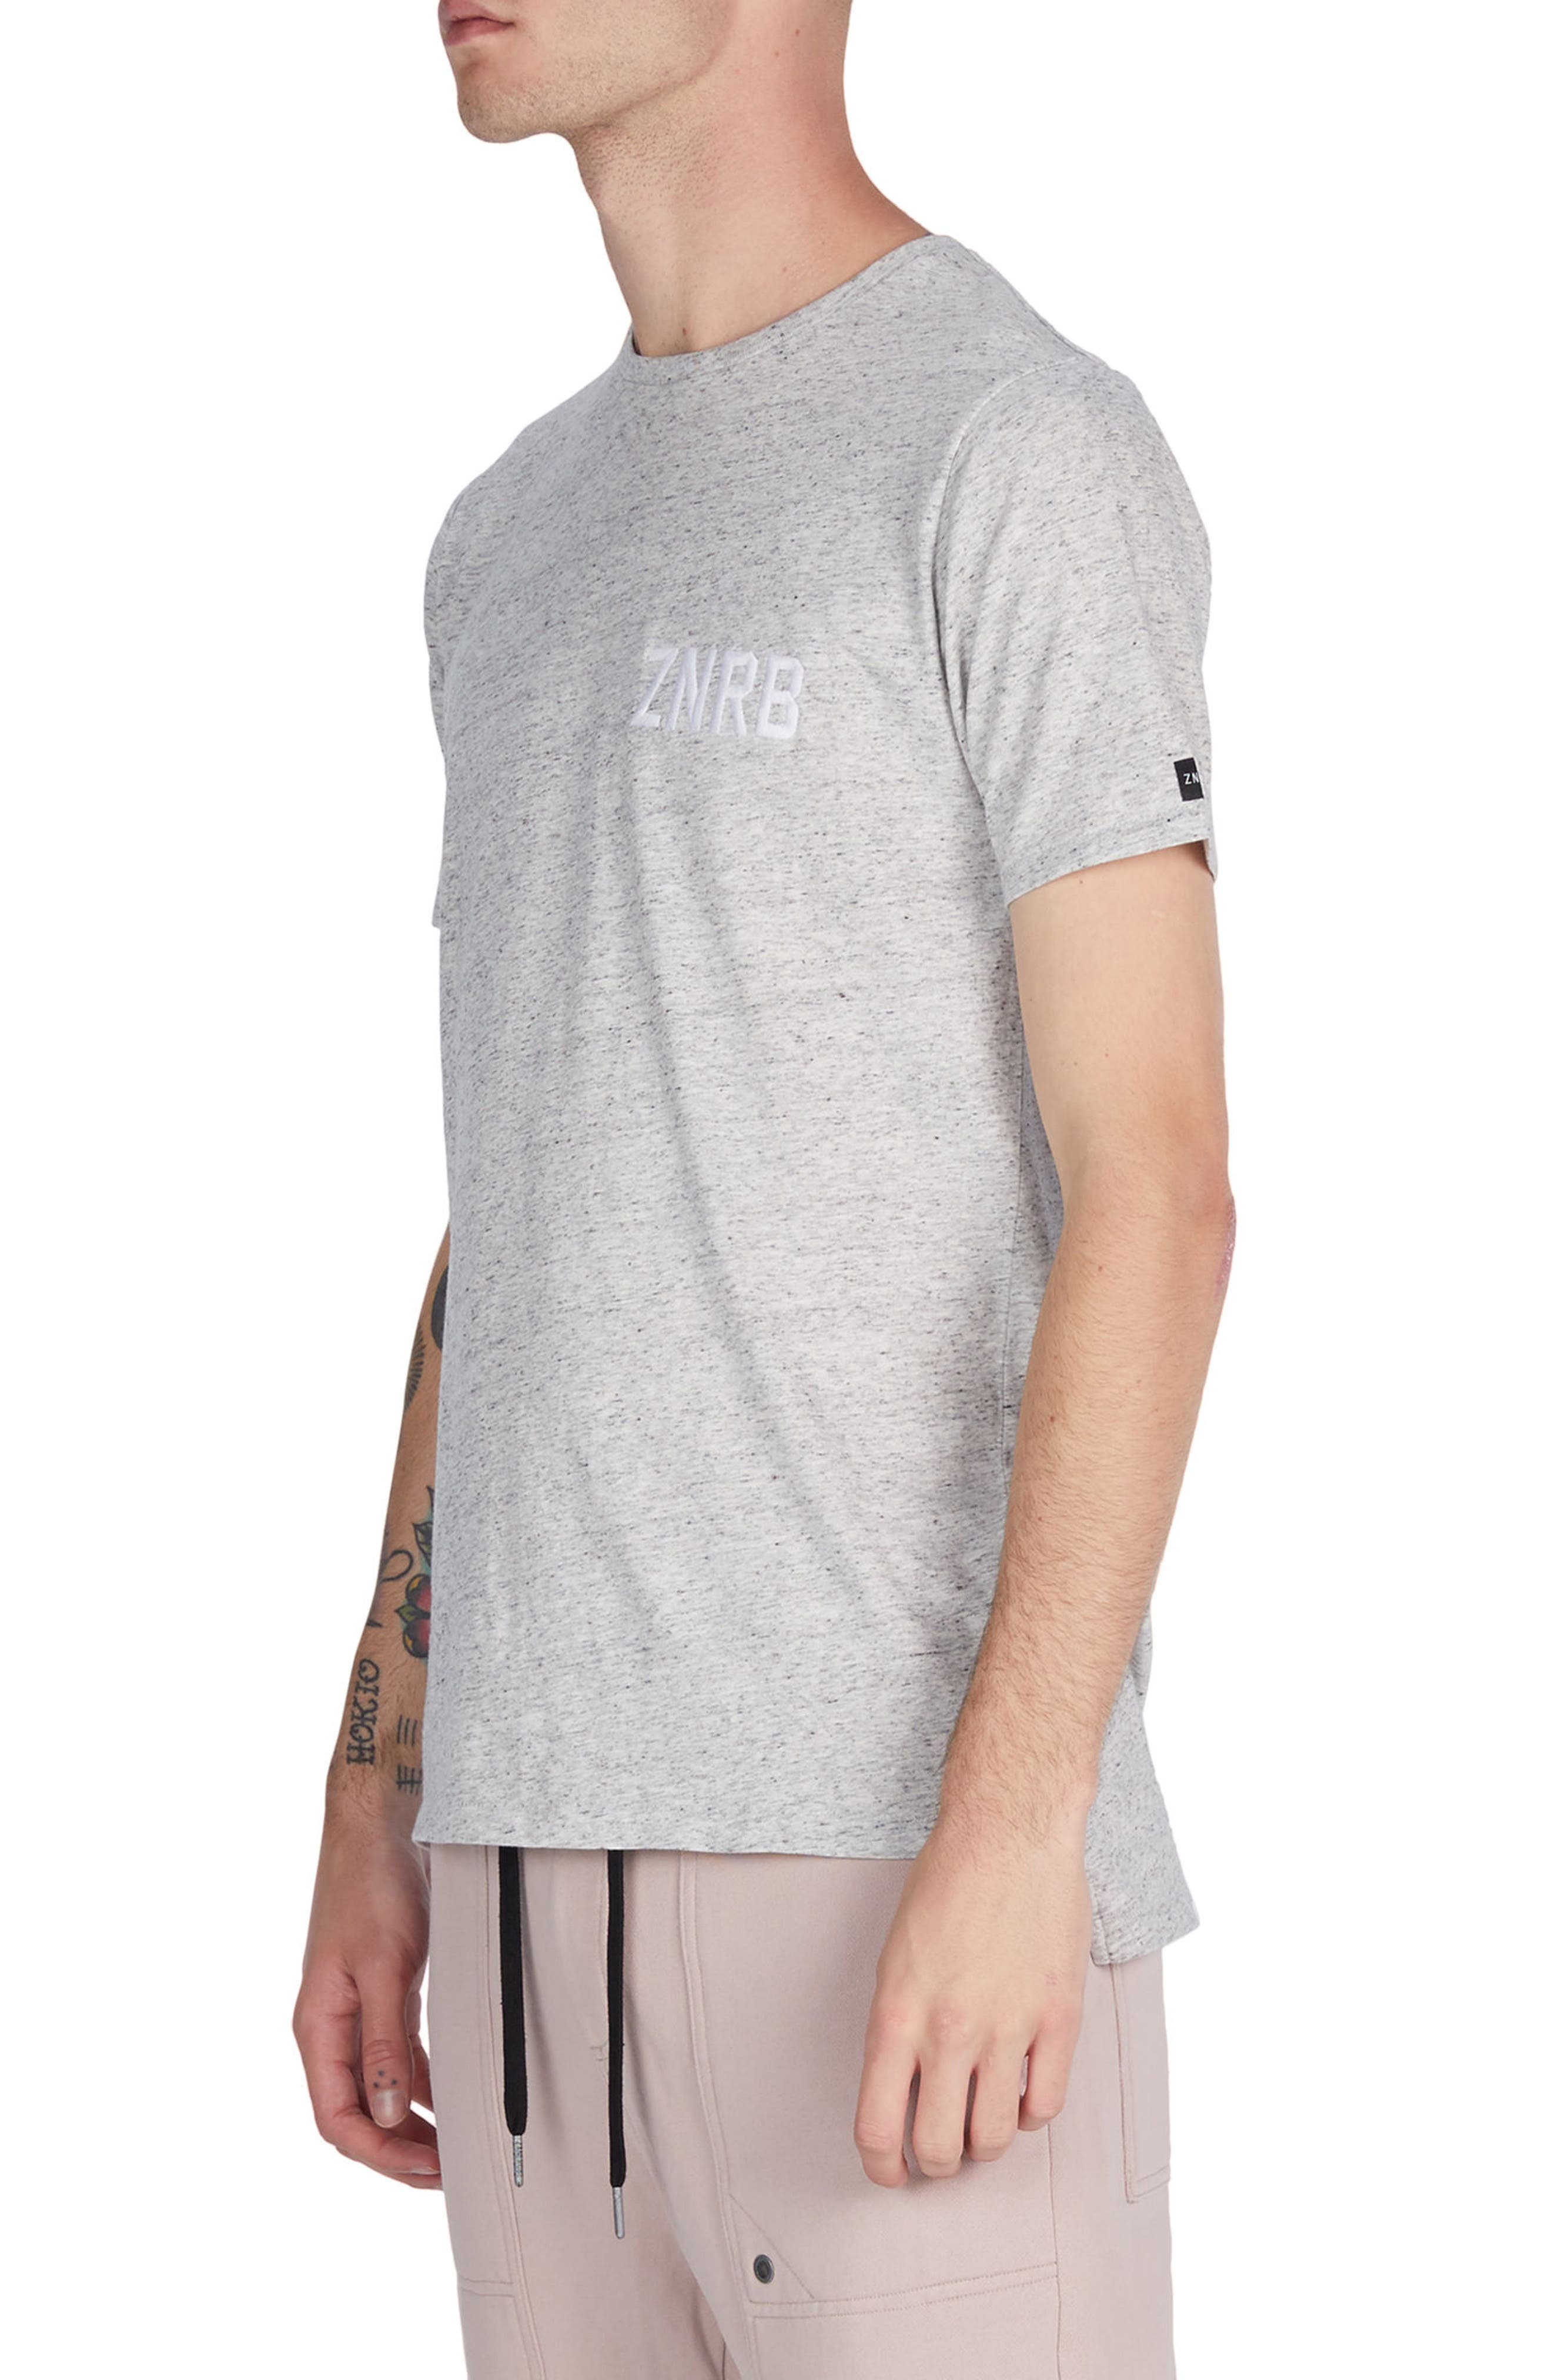 Flintlock T-Shirt,                             Alternate thumbnail 4, color,                             059